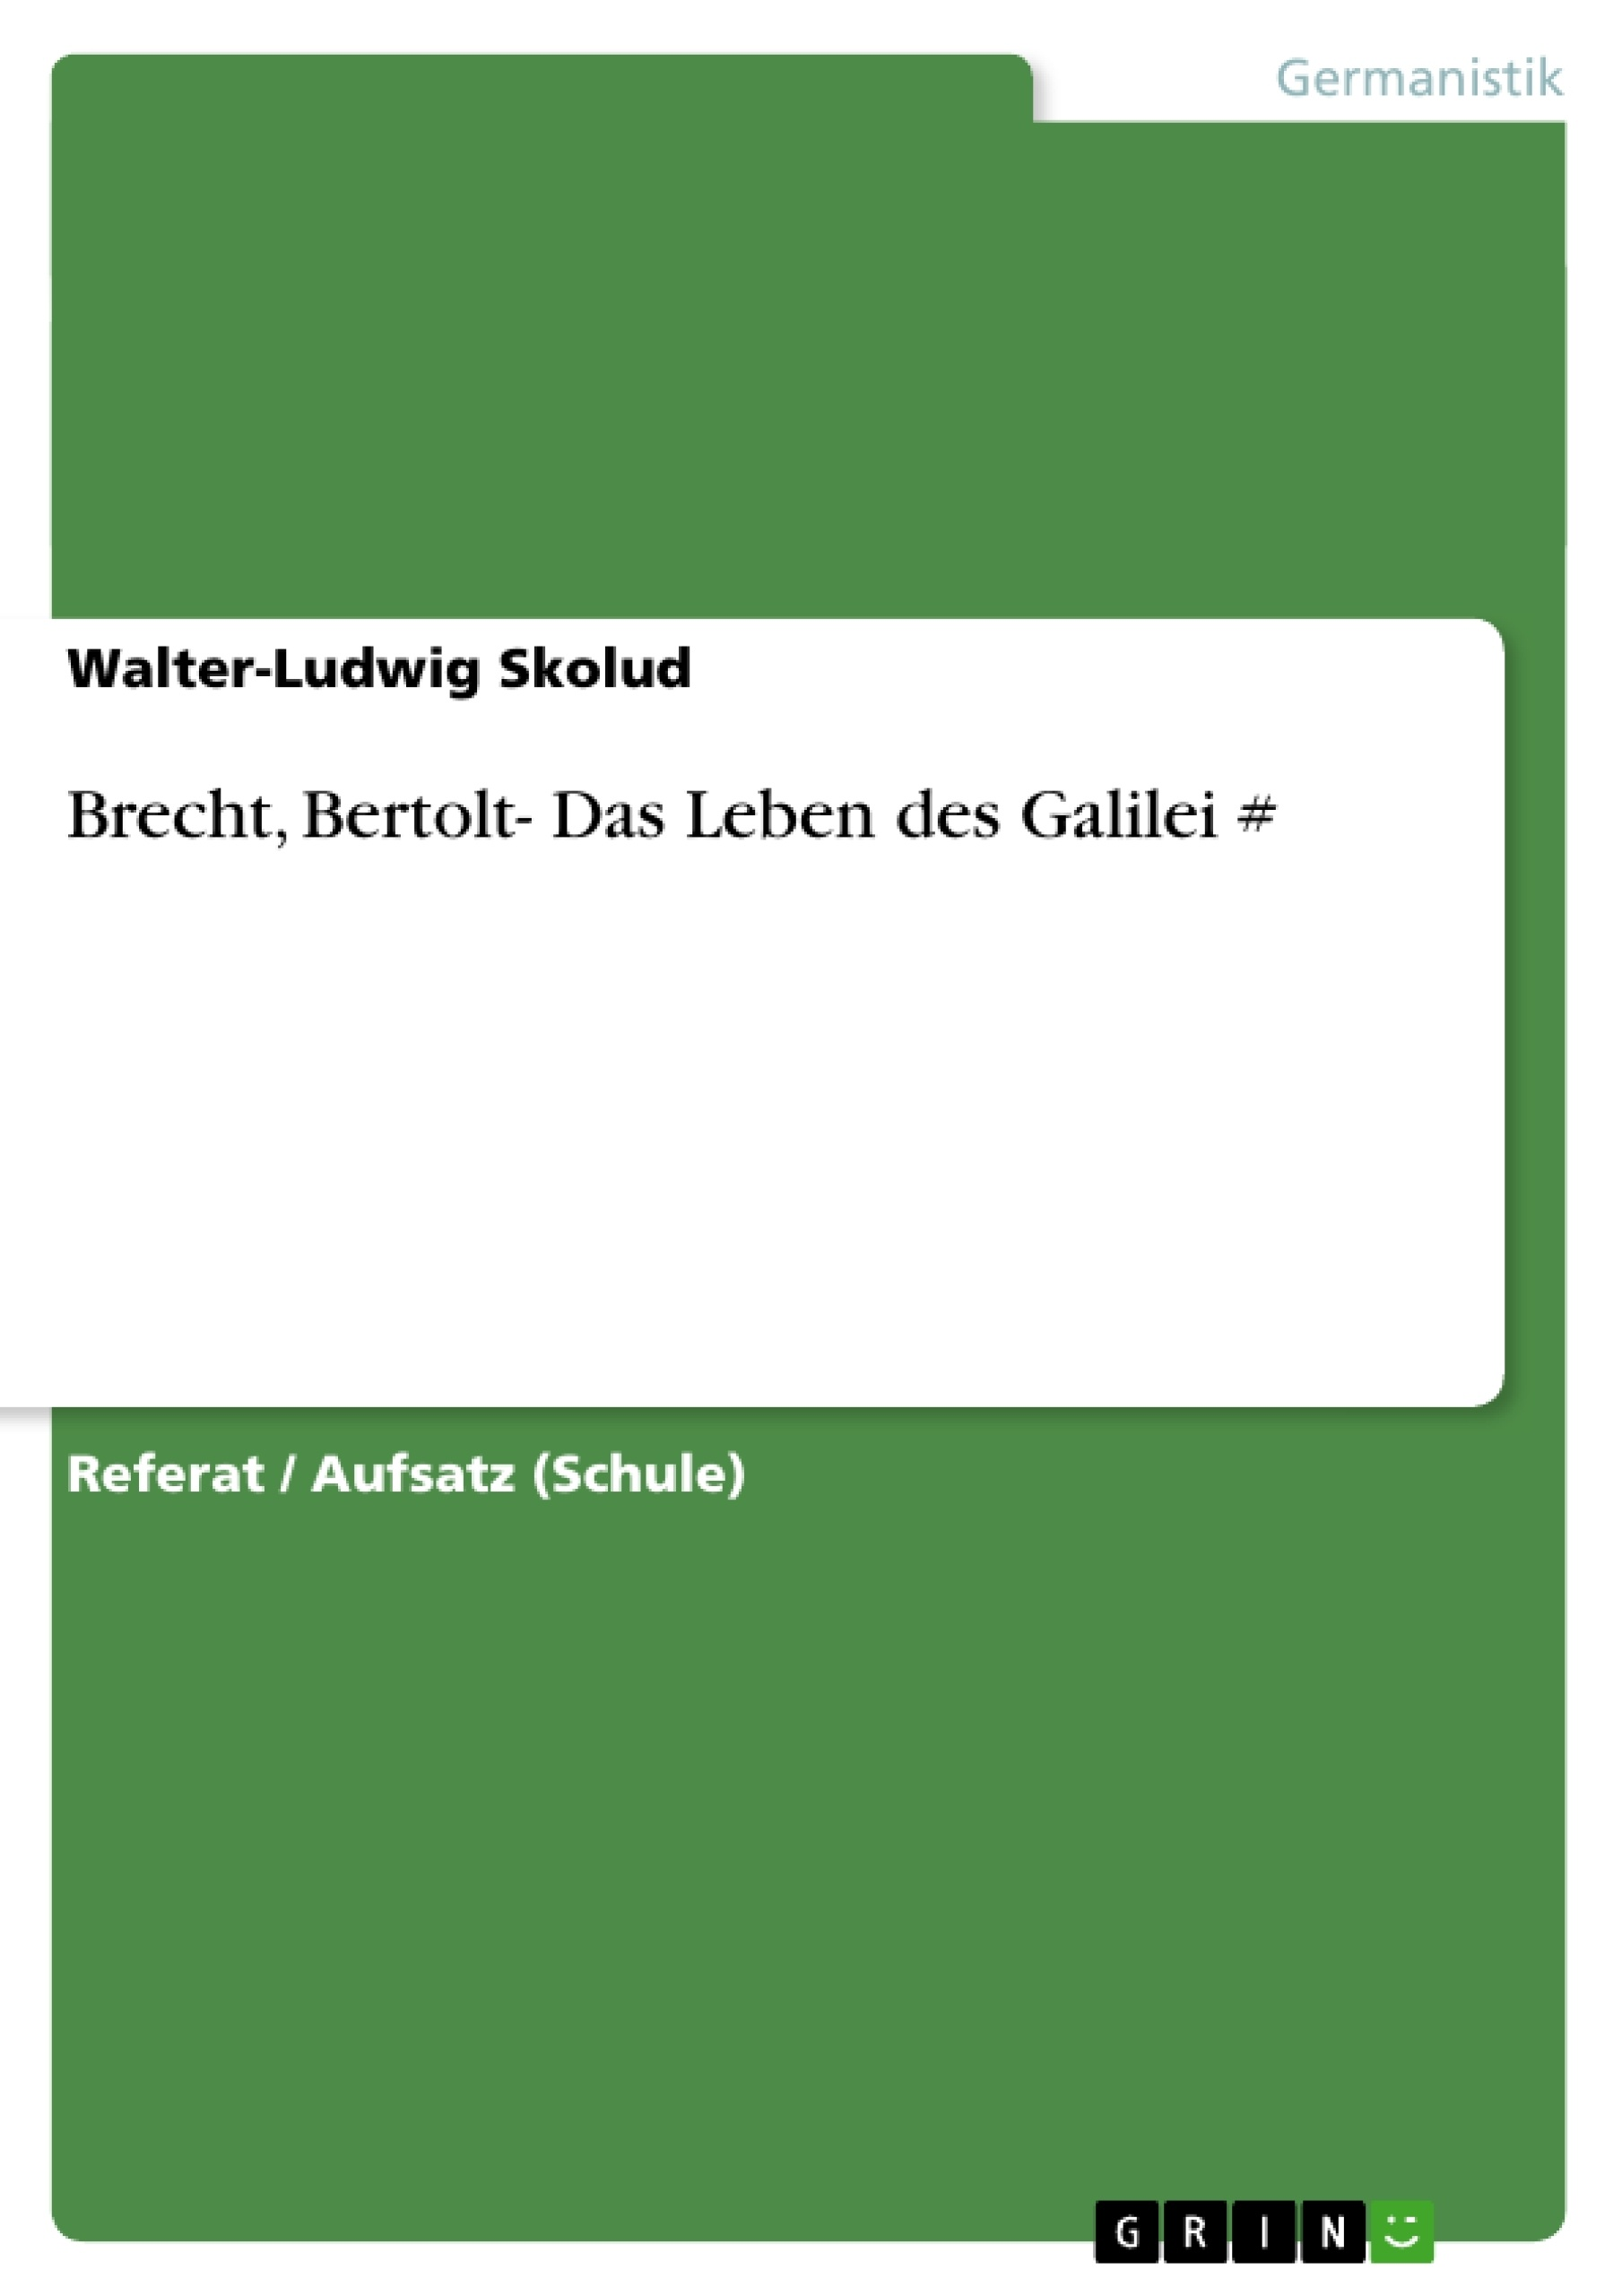 Titel: Brecht, Bertolt- Das Leben des Galilei #